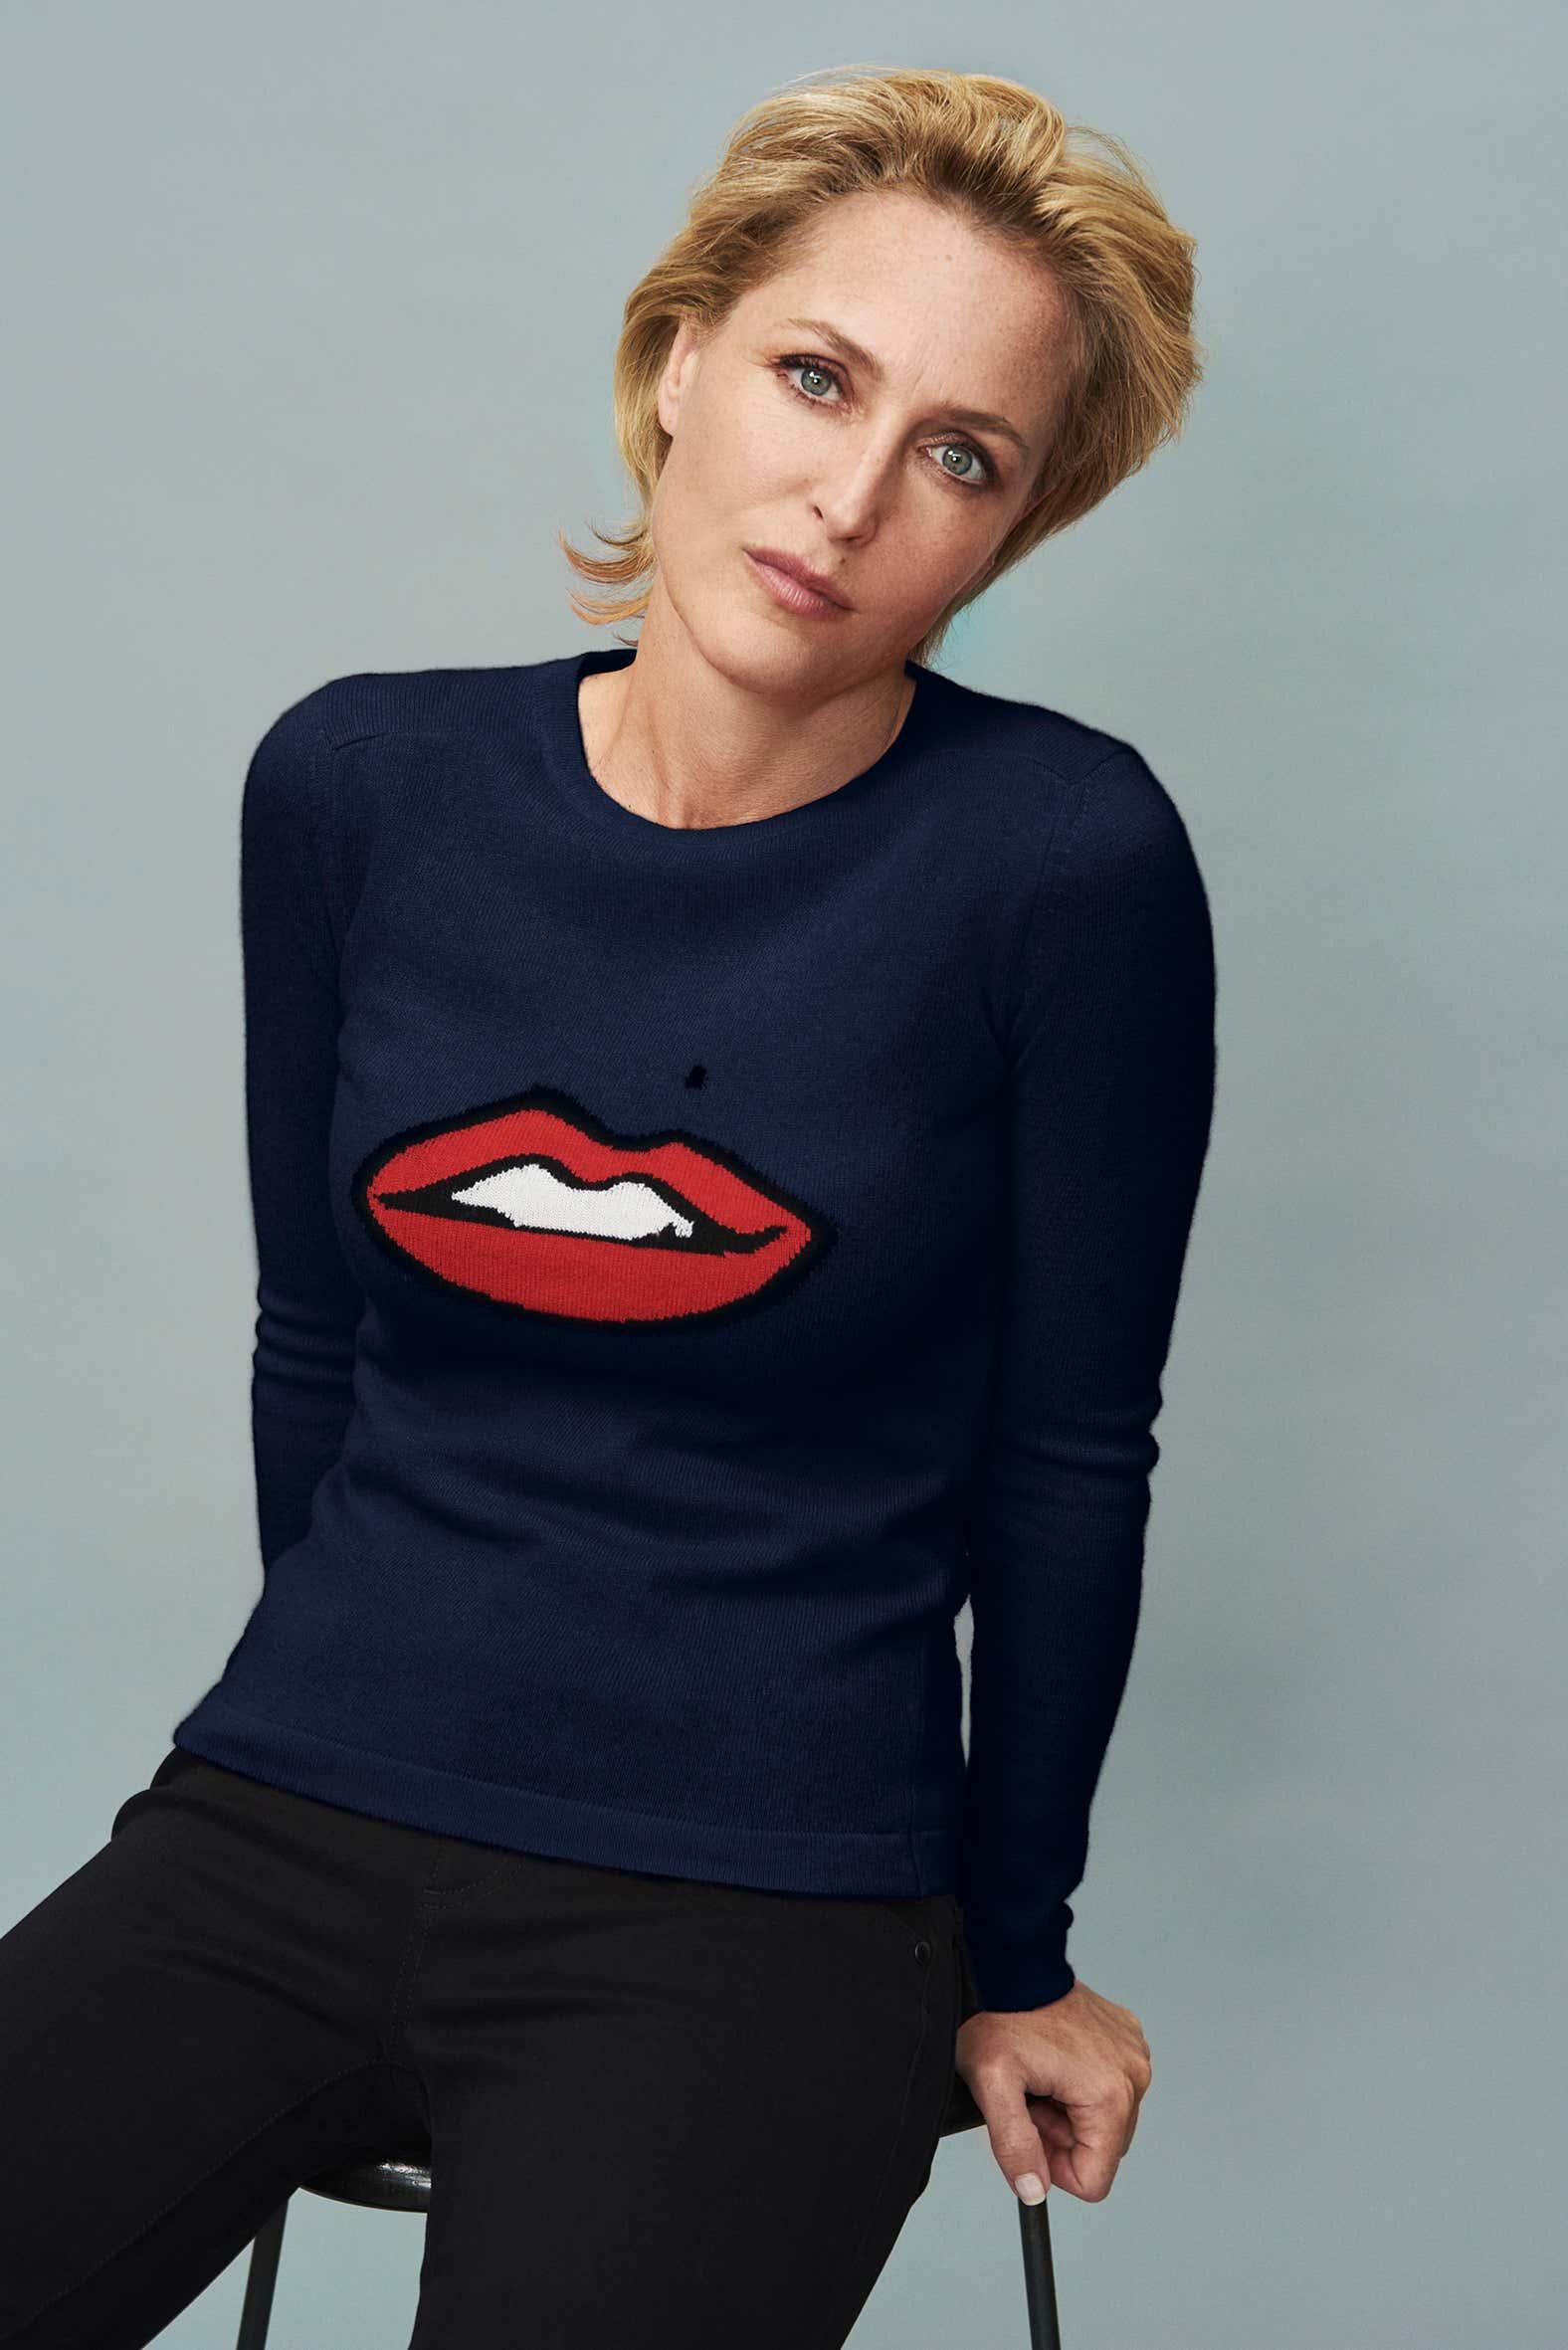 Gillian Anderson Lips jumper